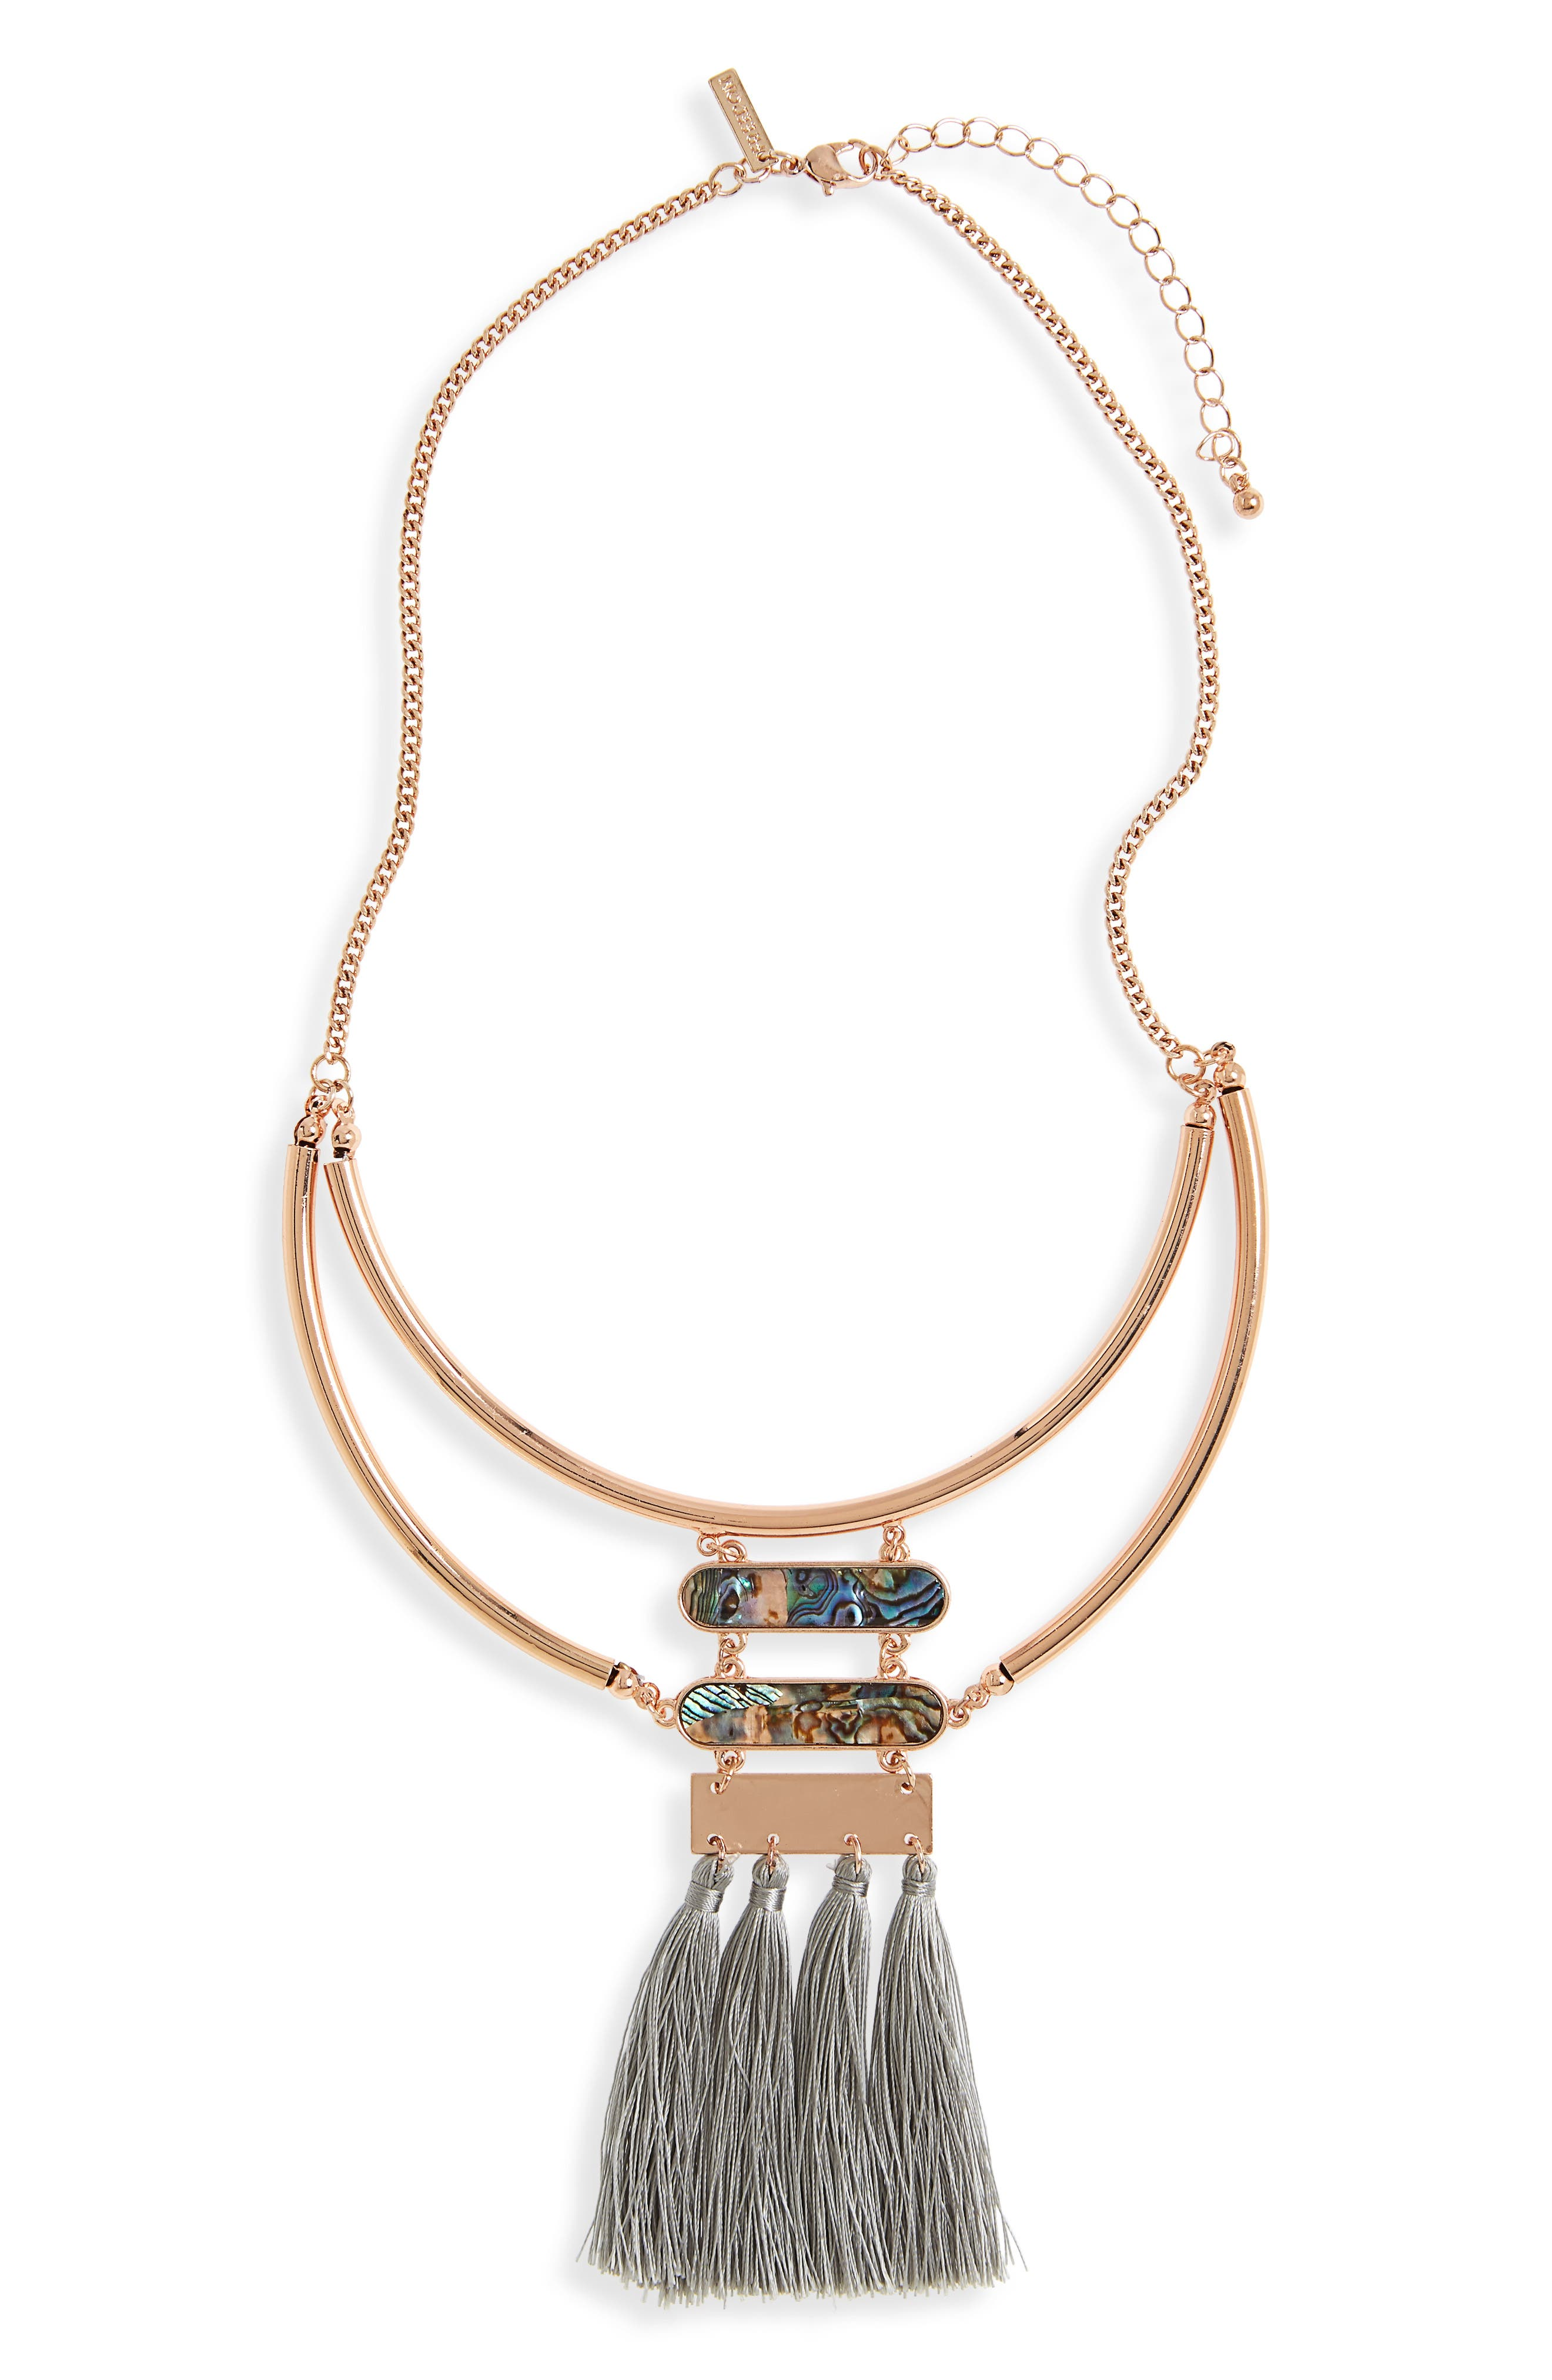 Abalone & Tassel Bib Necklace,                             Main thumbnail 1, color,                             340